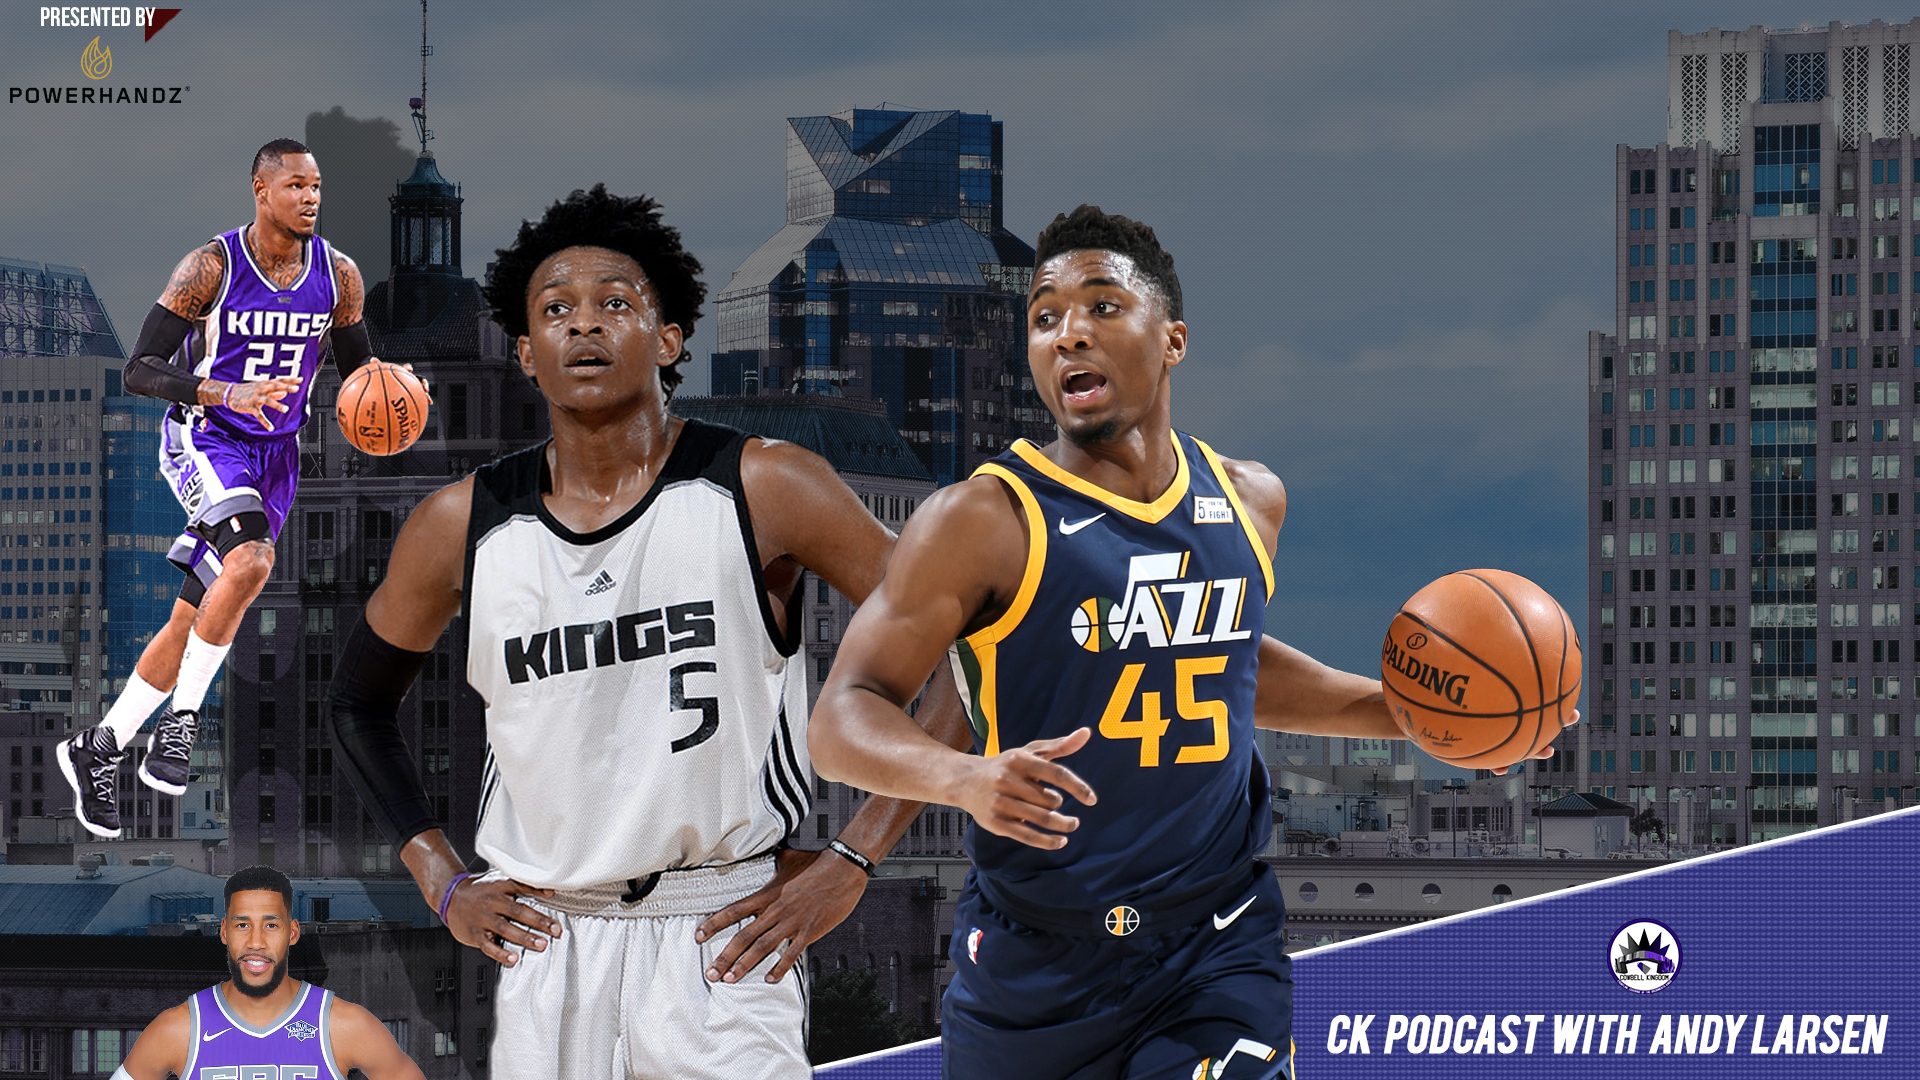 CK Podcast 348: Utah Jazz talk and breaking down the Garrett Temple trade